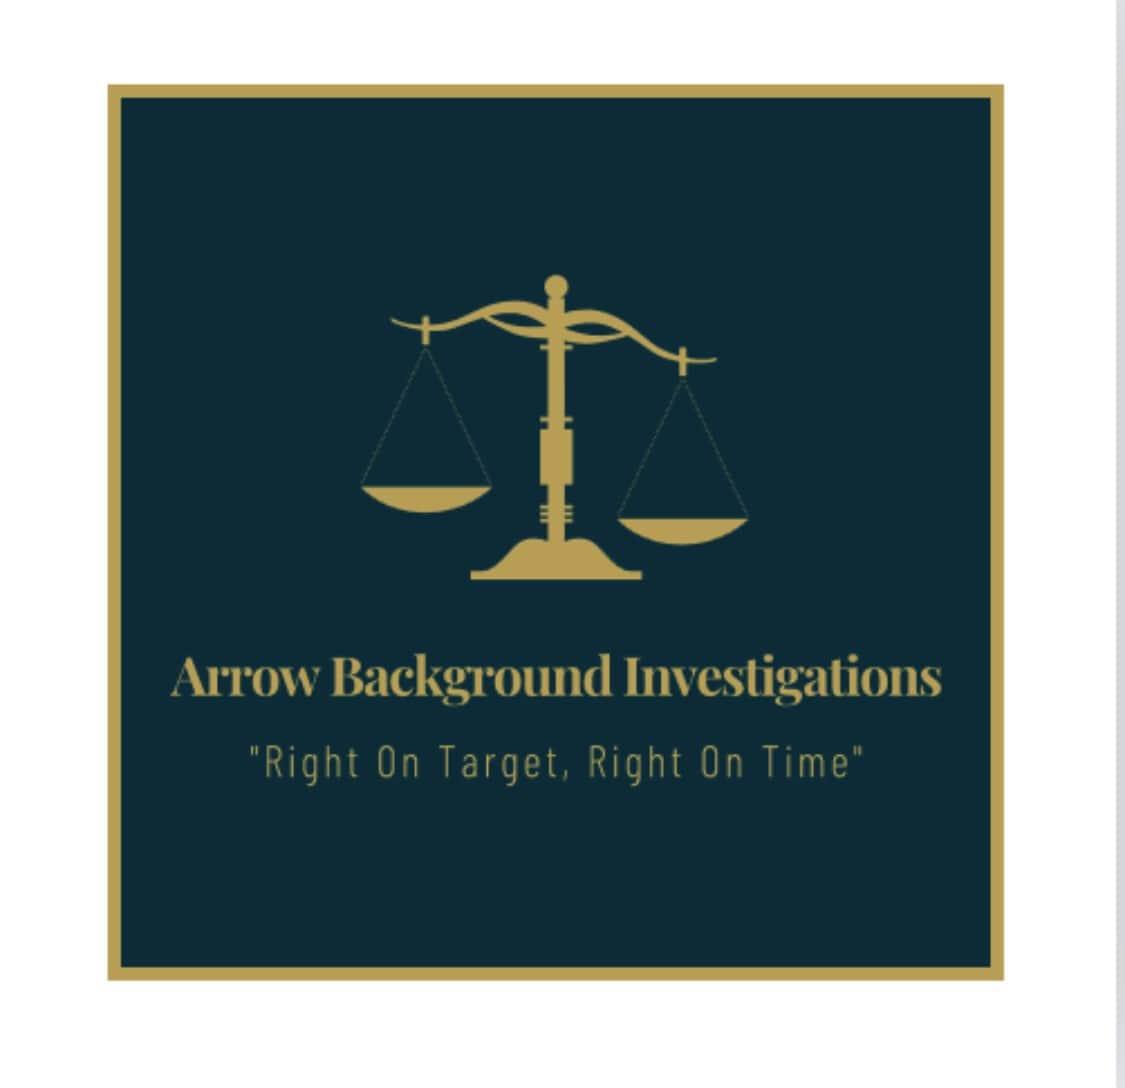 Arrow Background Investigations